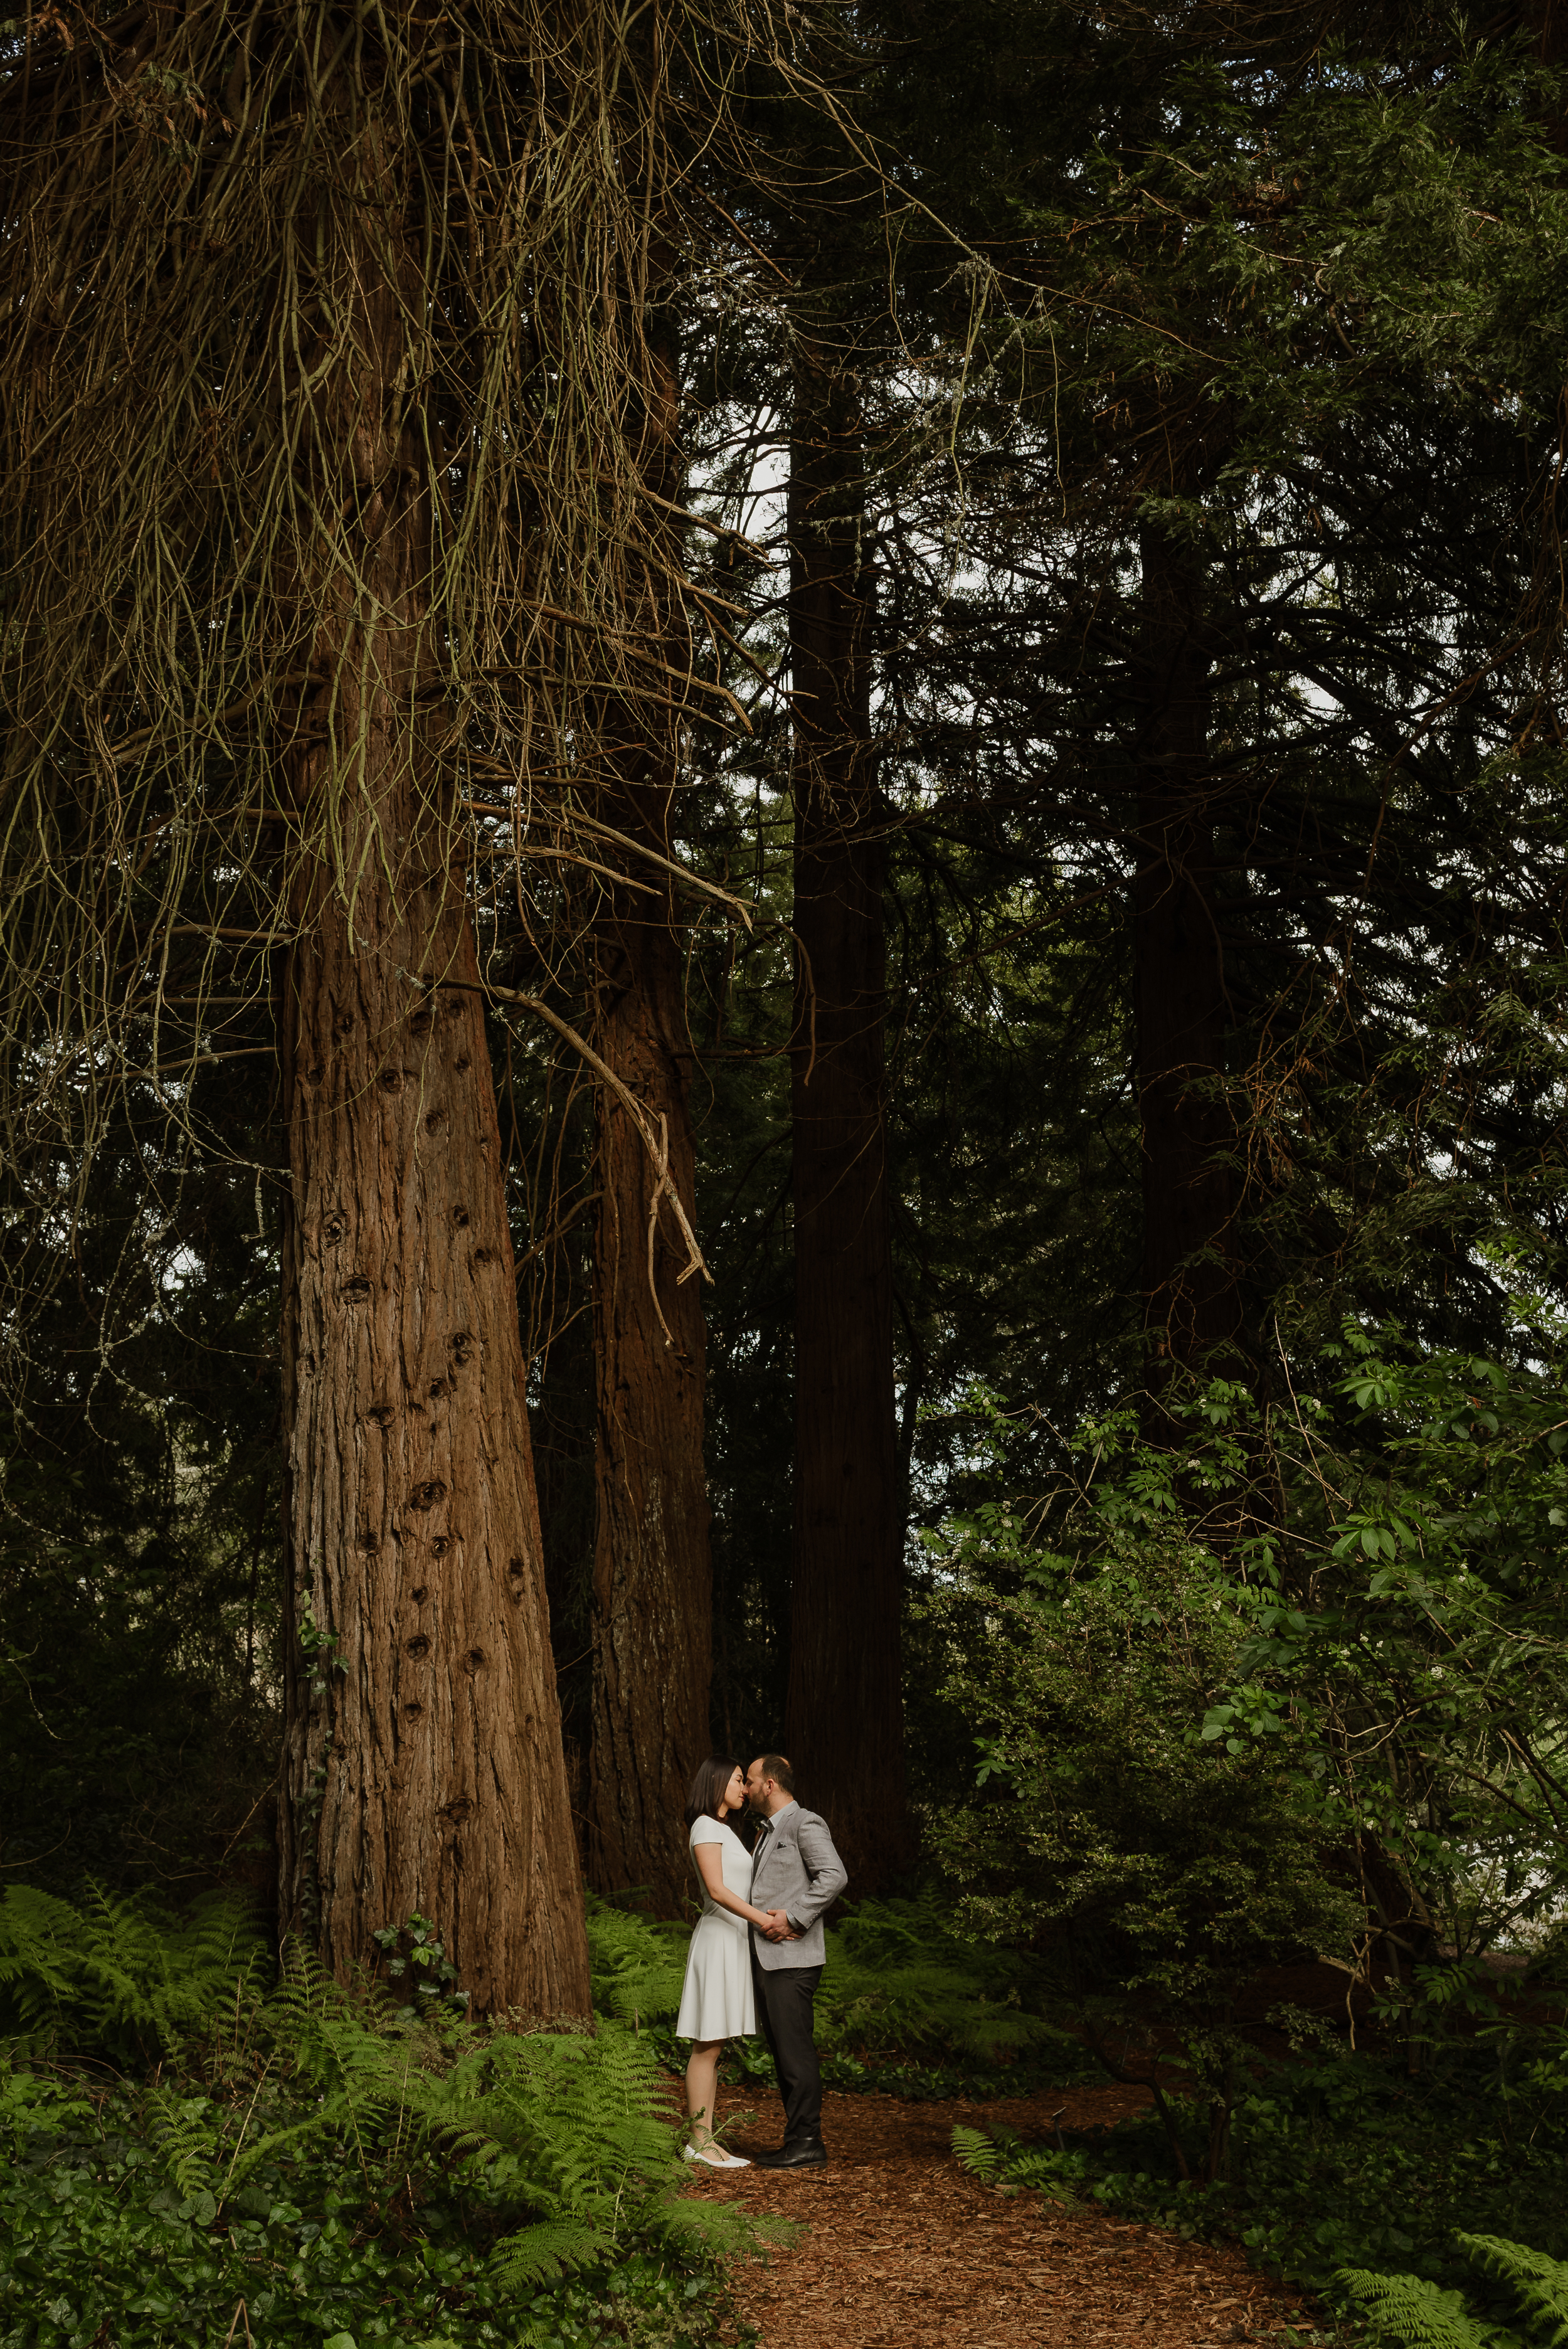 bamboo-pond-san-francisco-botanical-garden-engagement-shoot-vivianchen-059.jpg